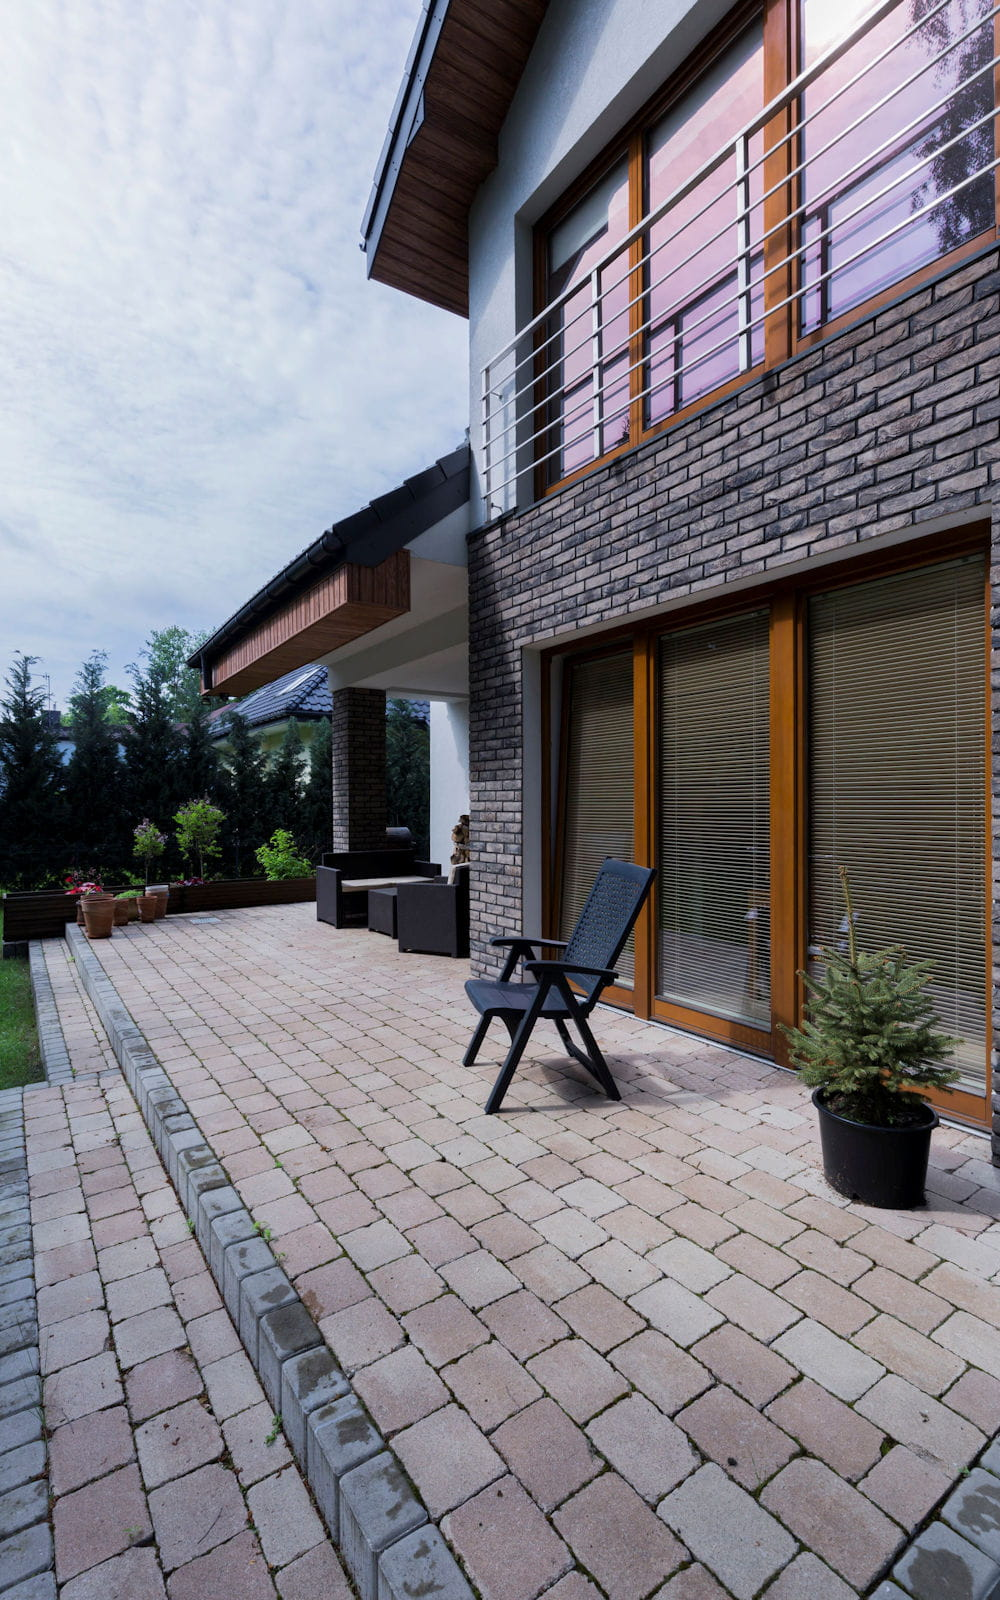 Comment Nettoyer Terrasse Pierre Naturelle nettoyer le sol d'une terrasse en pierre naturelle